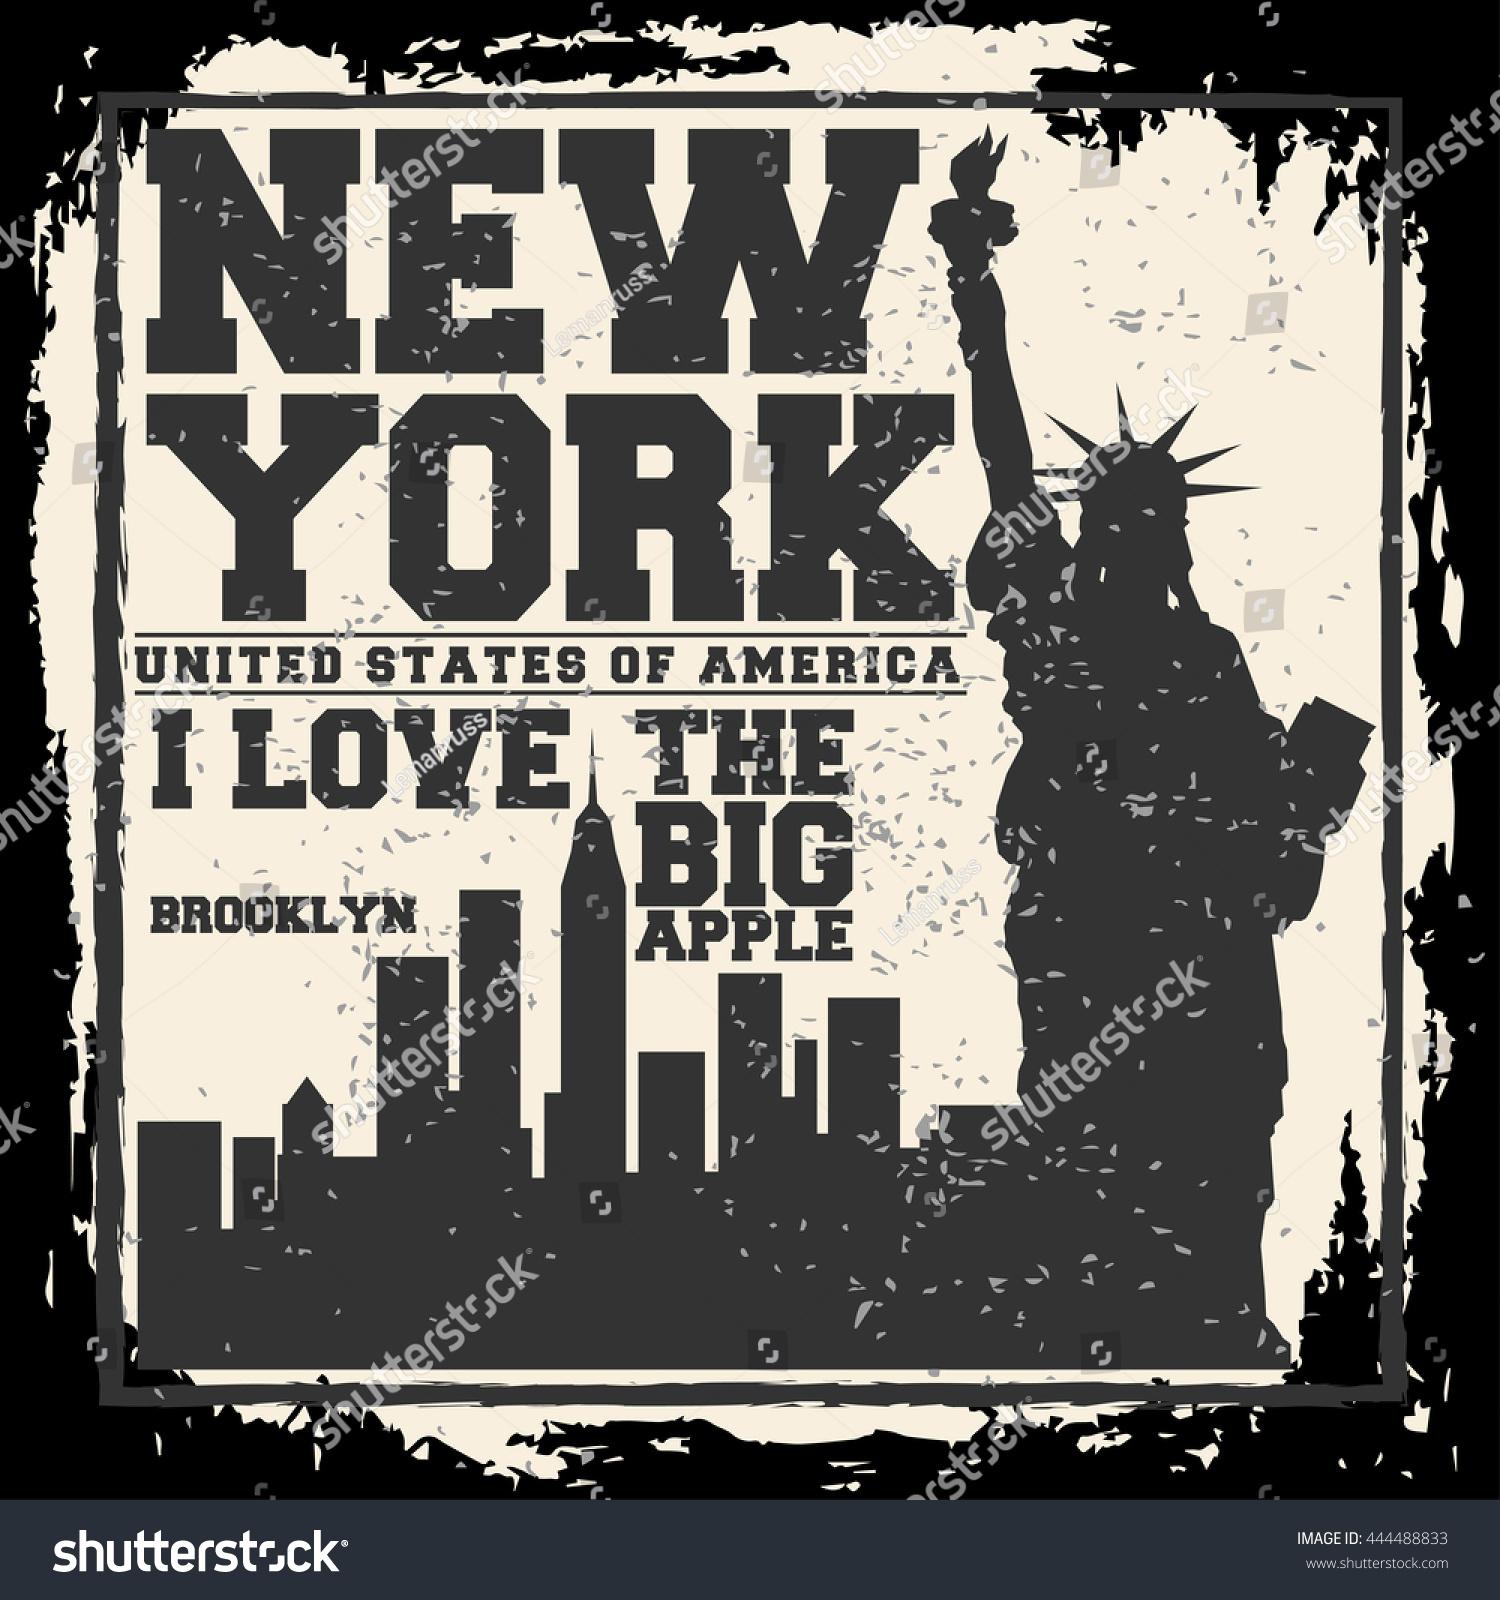 Poster design nyc - Poster Design New York New York City Concept Logo Label T Shirt Design Nyc